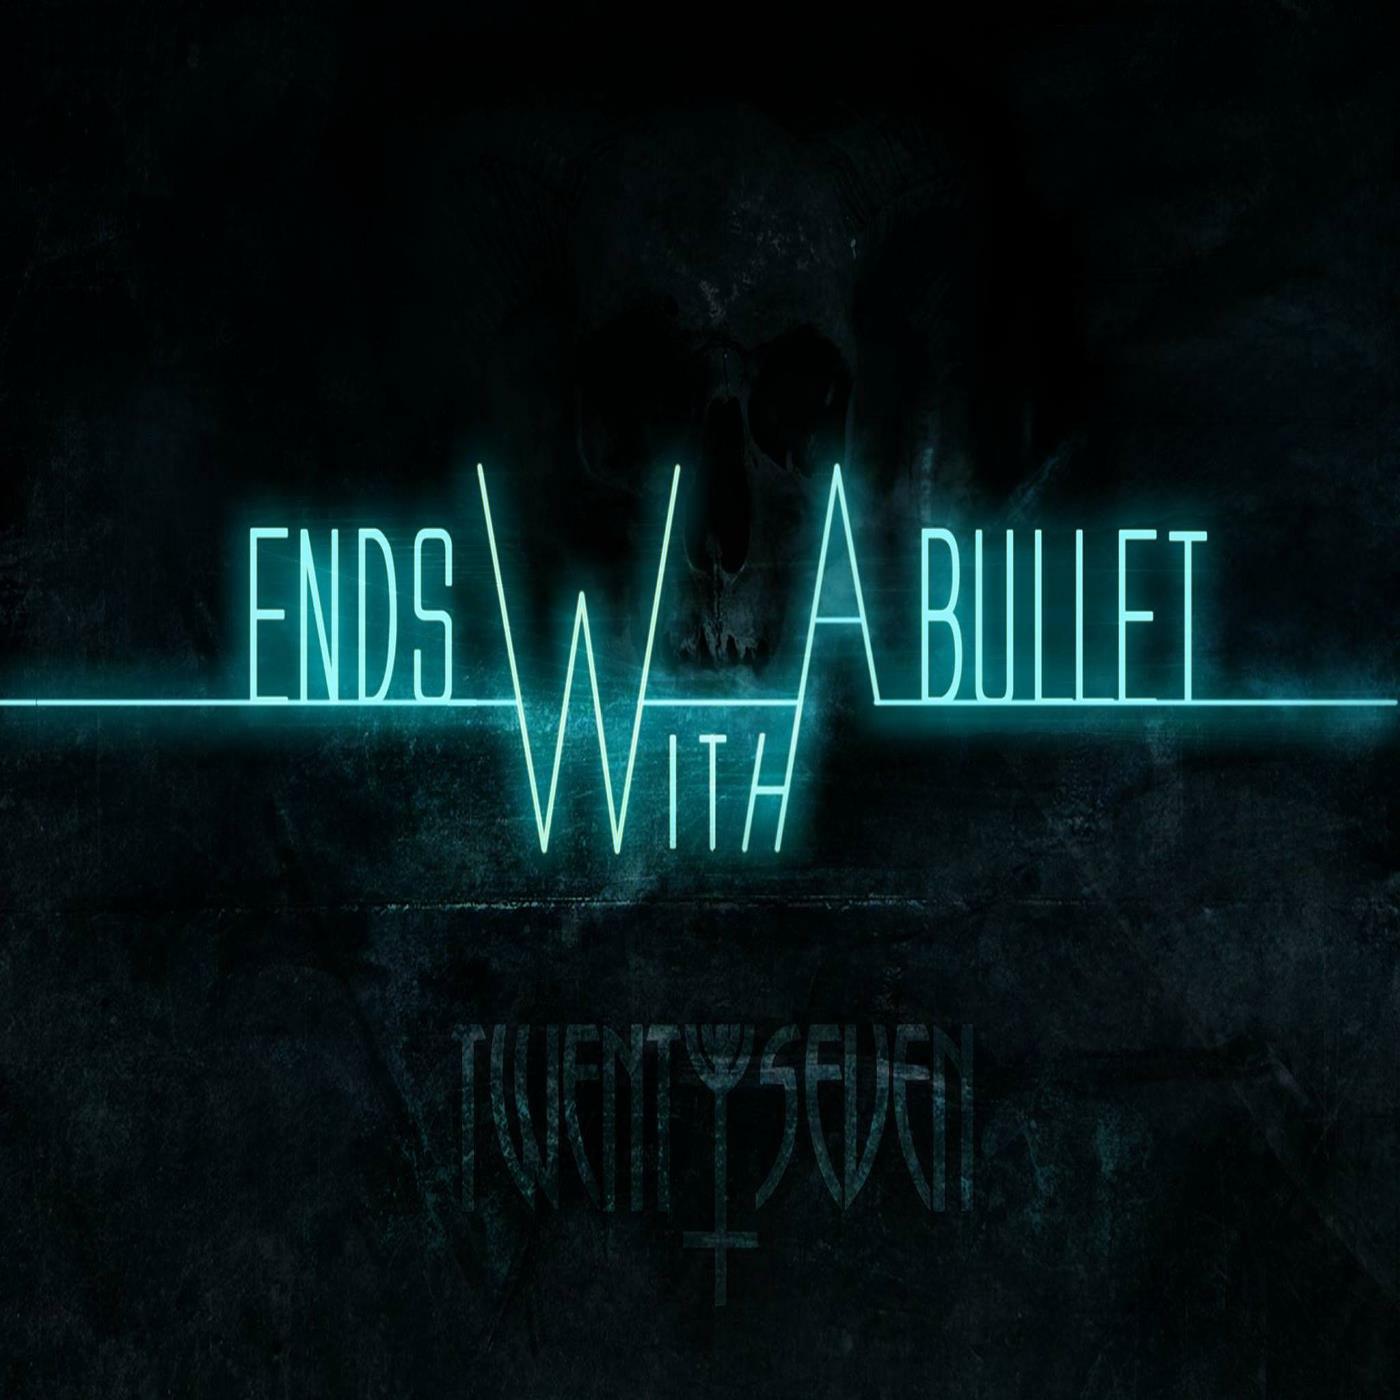 Ends With A Bullet - Twenty seven (2014)